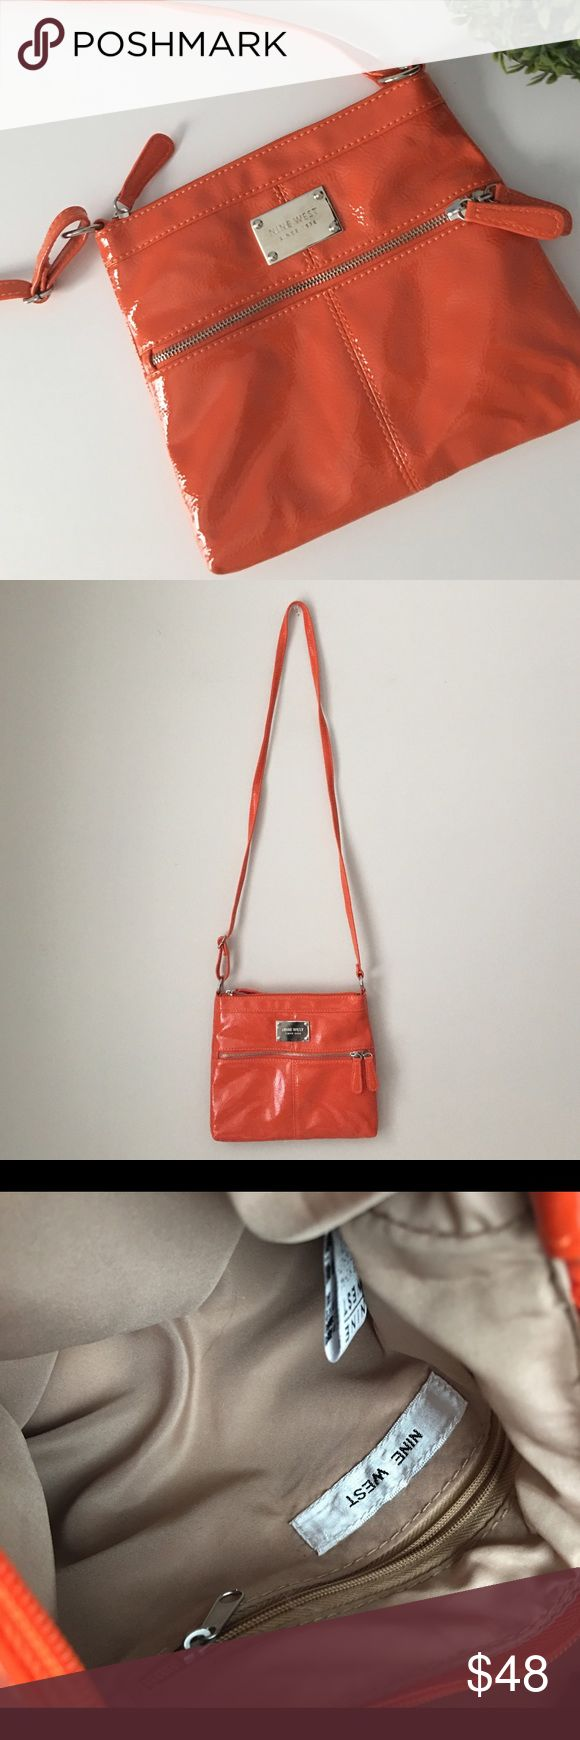 Nine West Orange Patent Crossbody Gorgeous orange patent Crossbody by Nine West. Nine West Bags Crossbody Bags